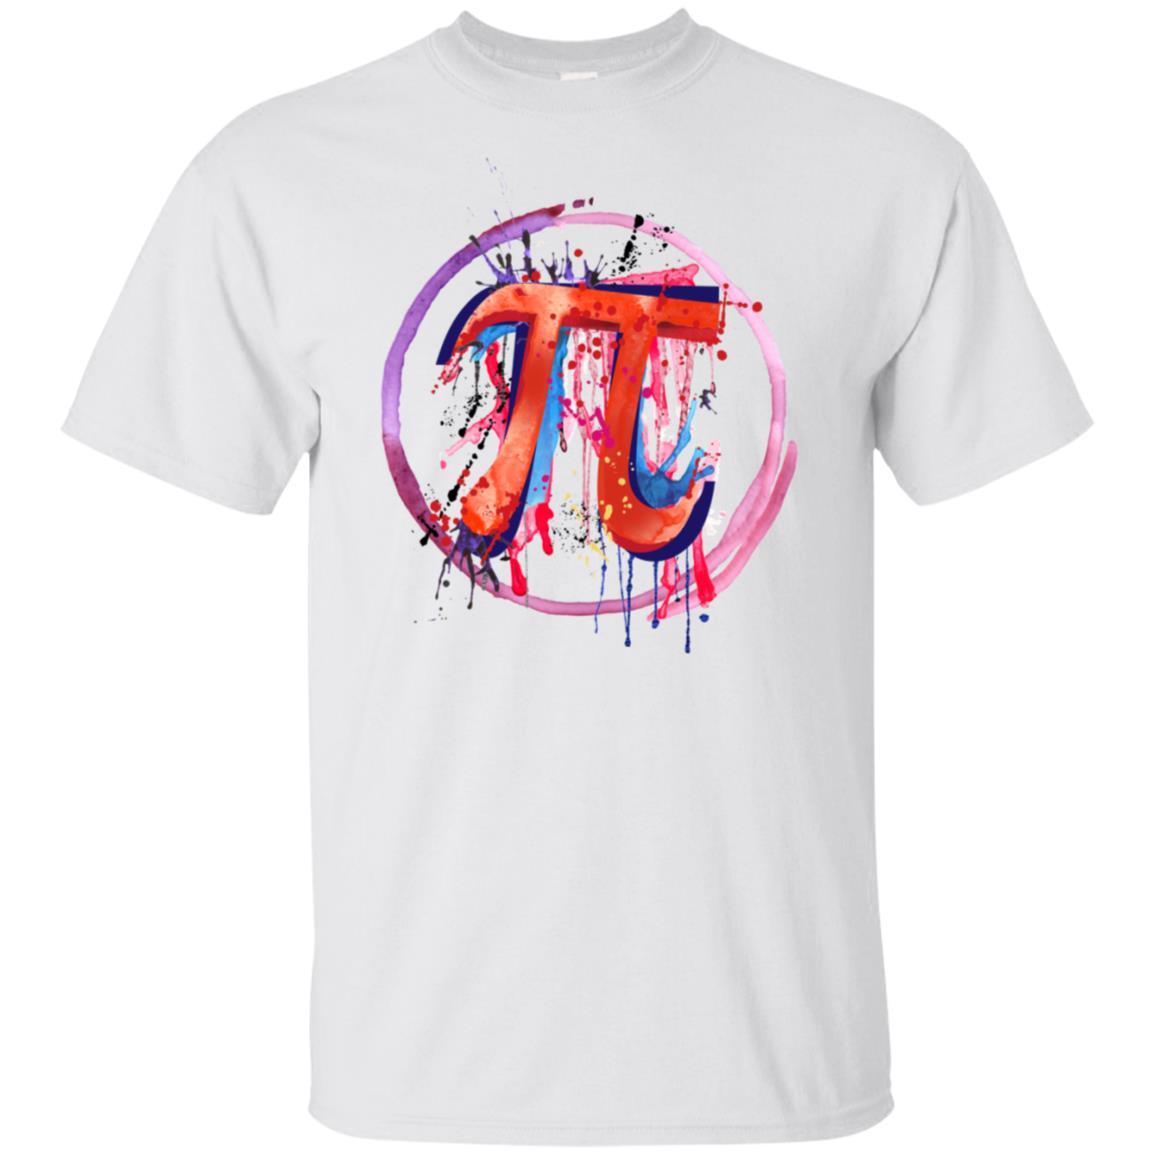 Emotional Pi, Drip Art Unisex Short Sleeve